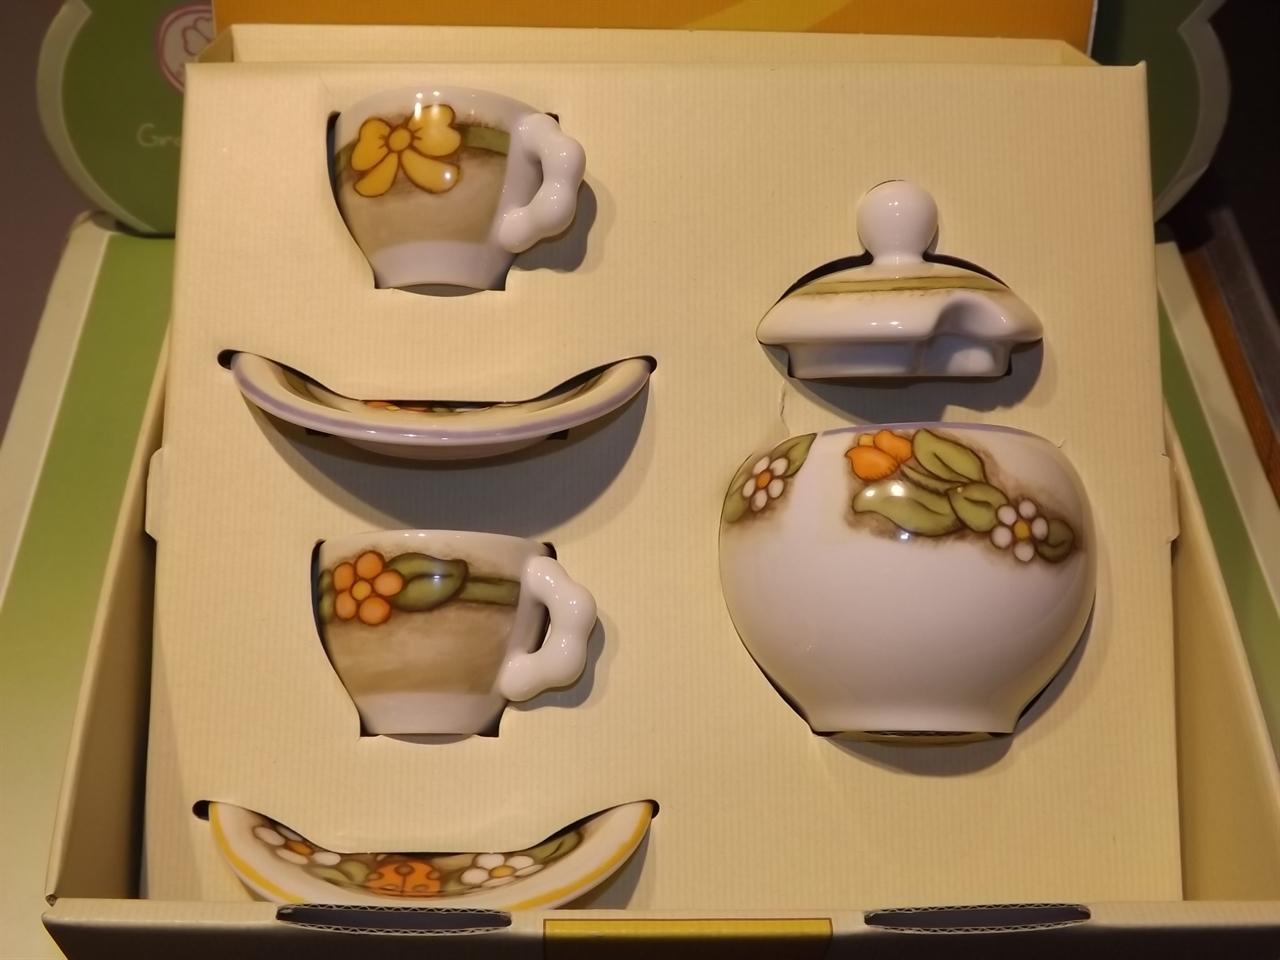 Emejing thun cucina prezzi ideas home interior ideas - Orologio cucina thun ...